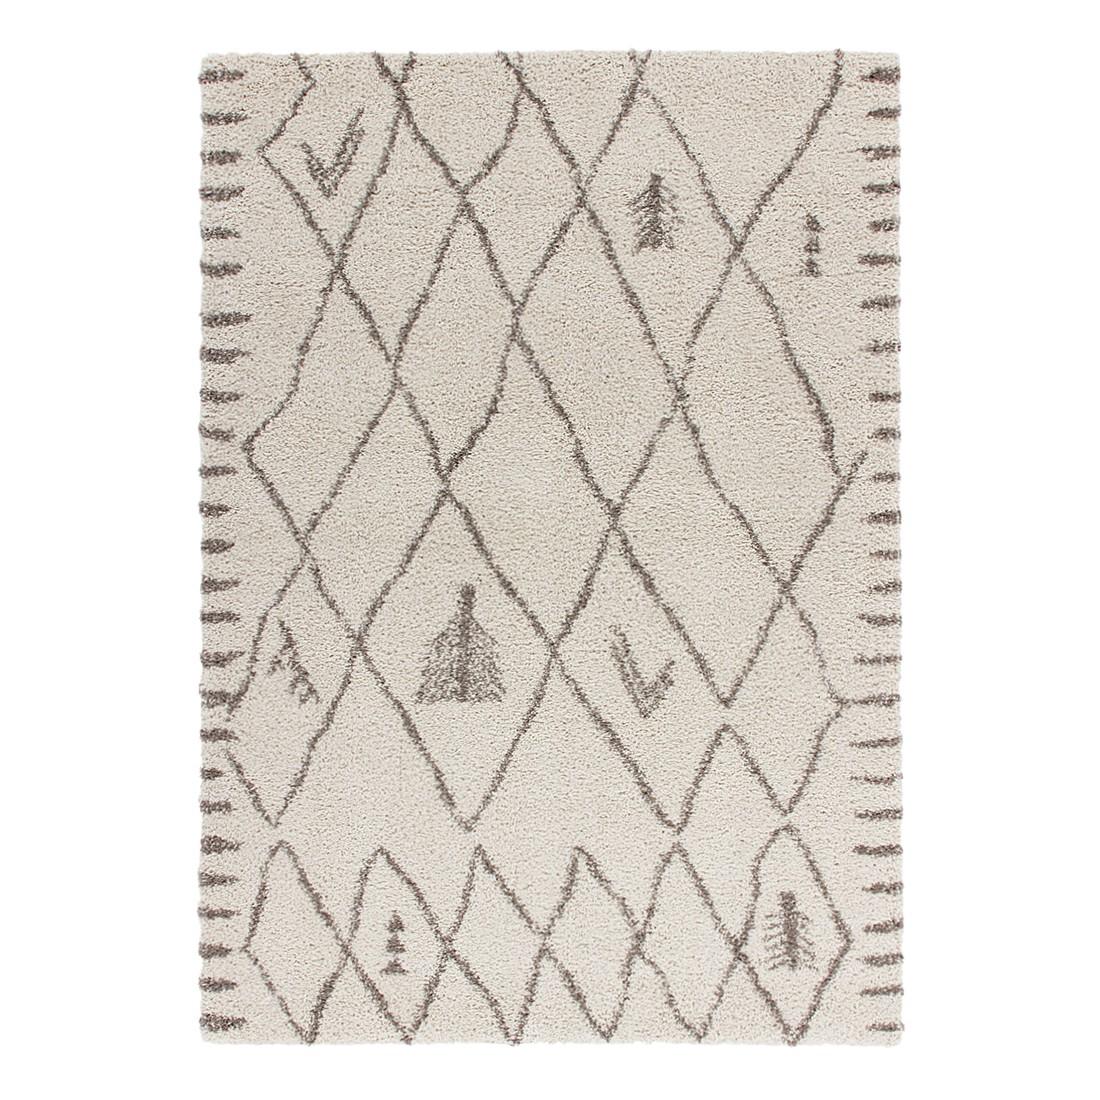 Teppich Romania – Brasov – Beige – 160 x 230 cm, Kayoom günstig